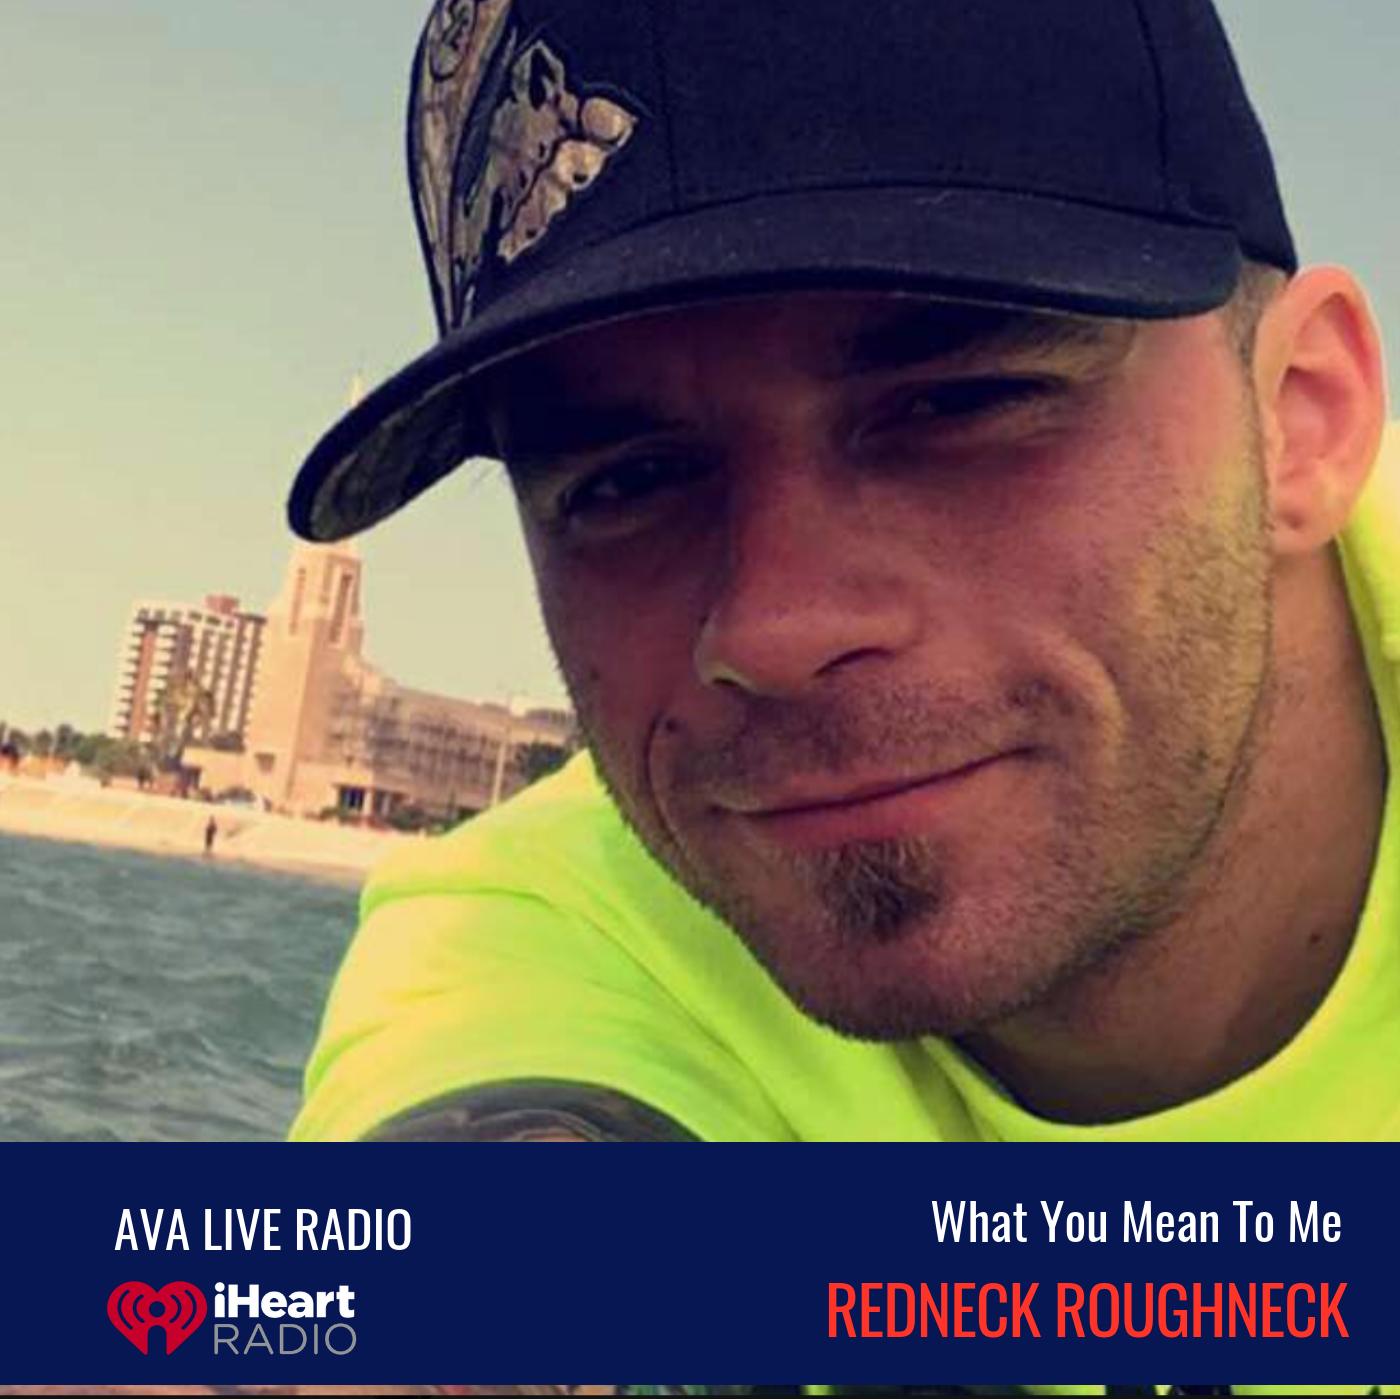 RedneckRoughneck avaliveradio.png